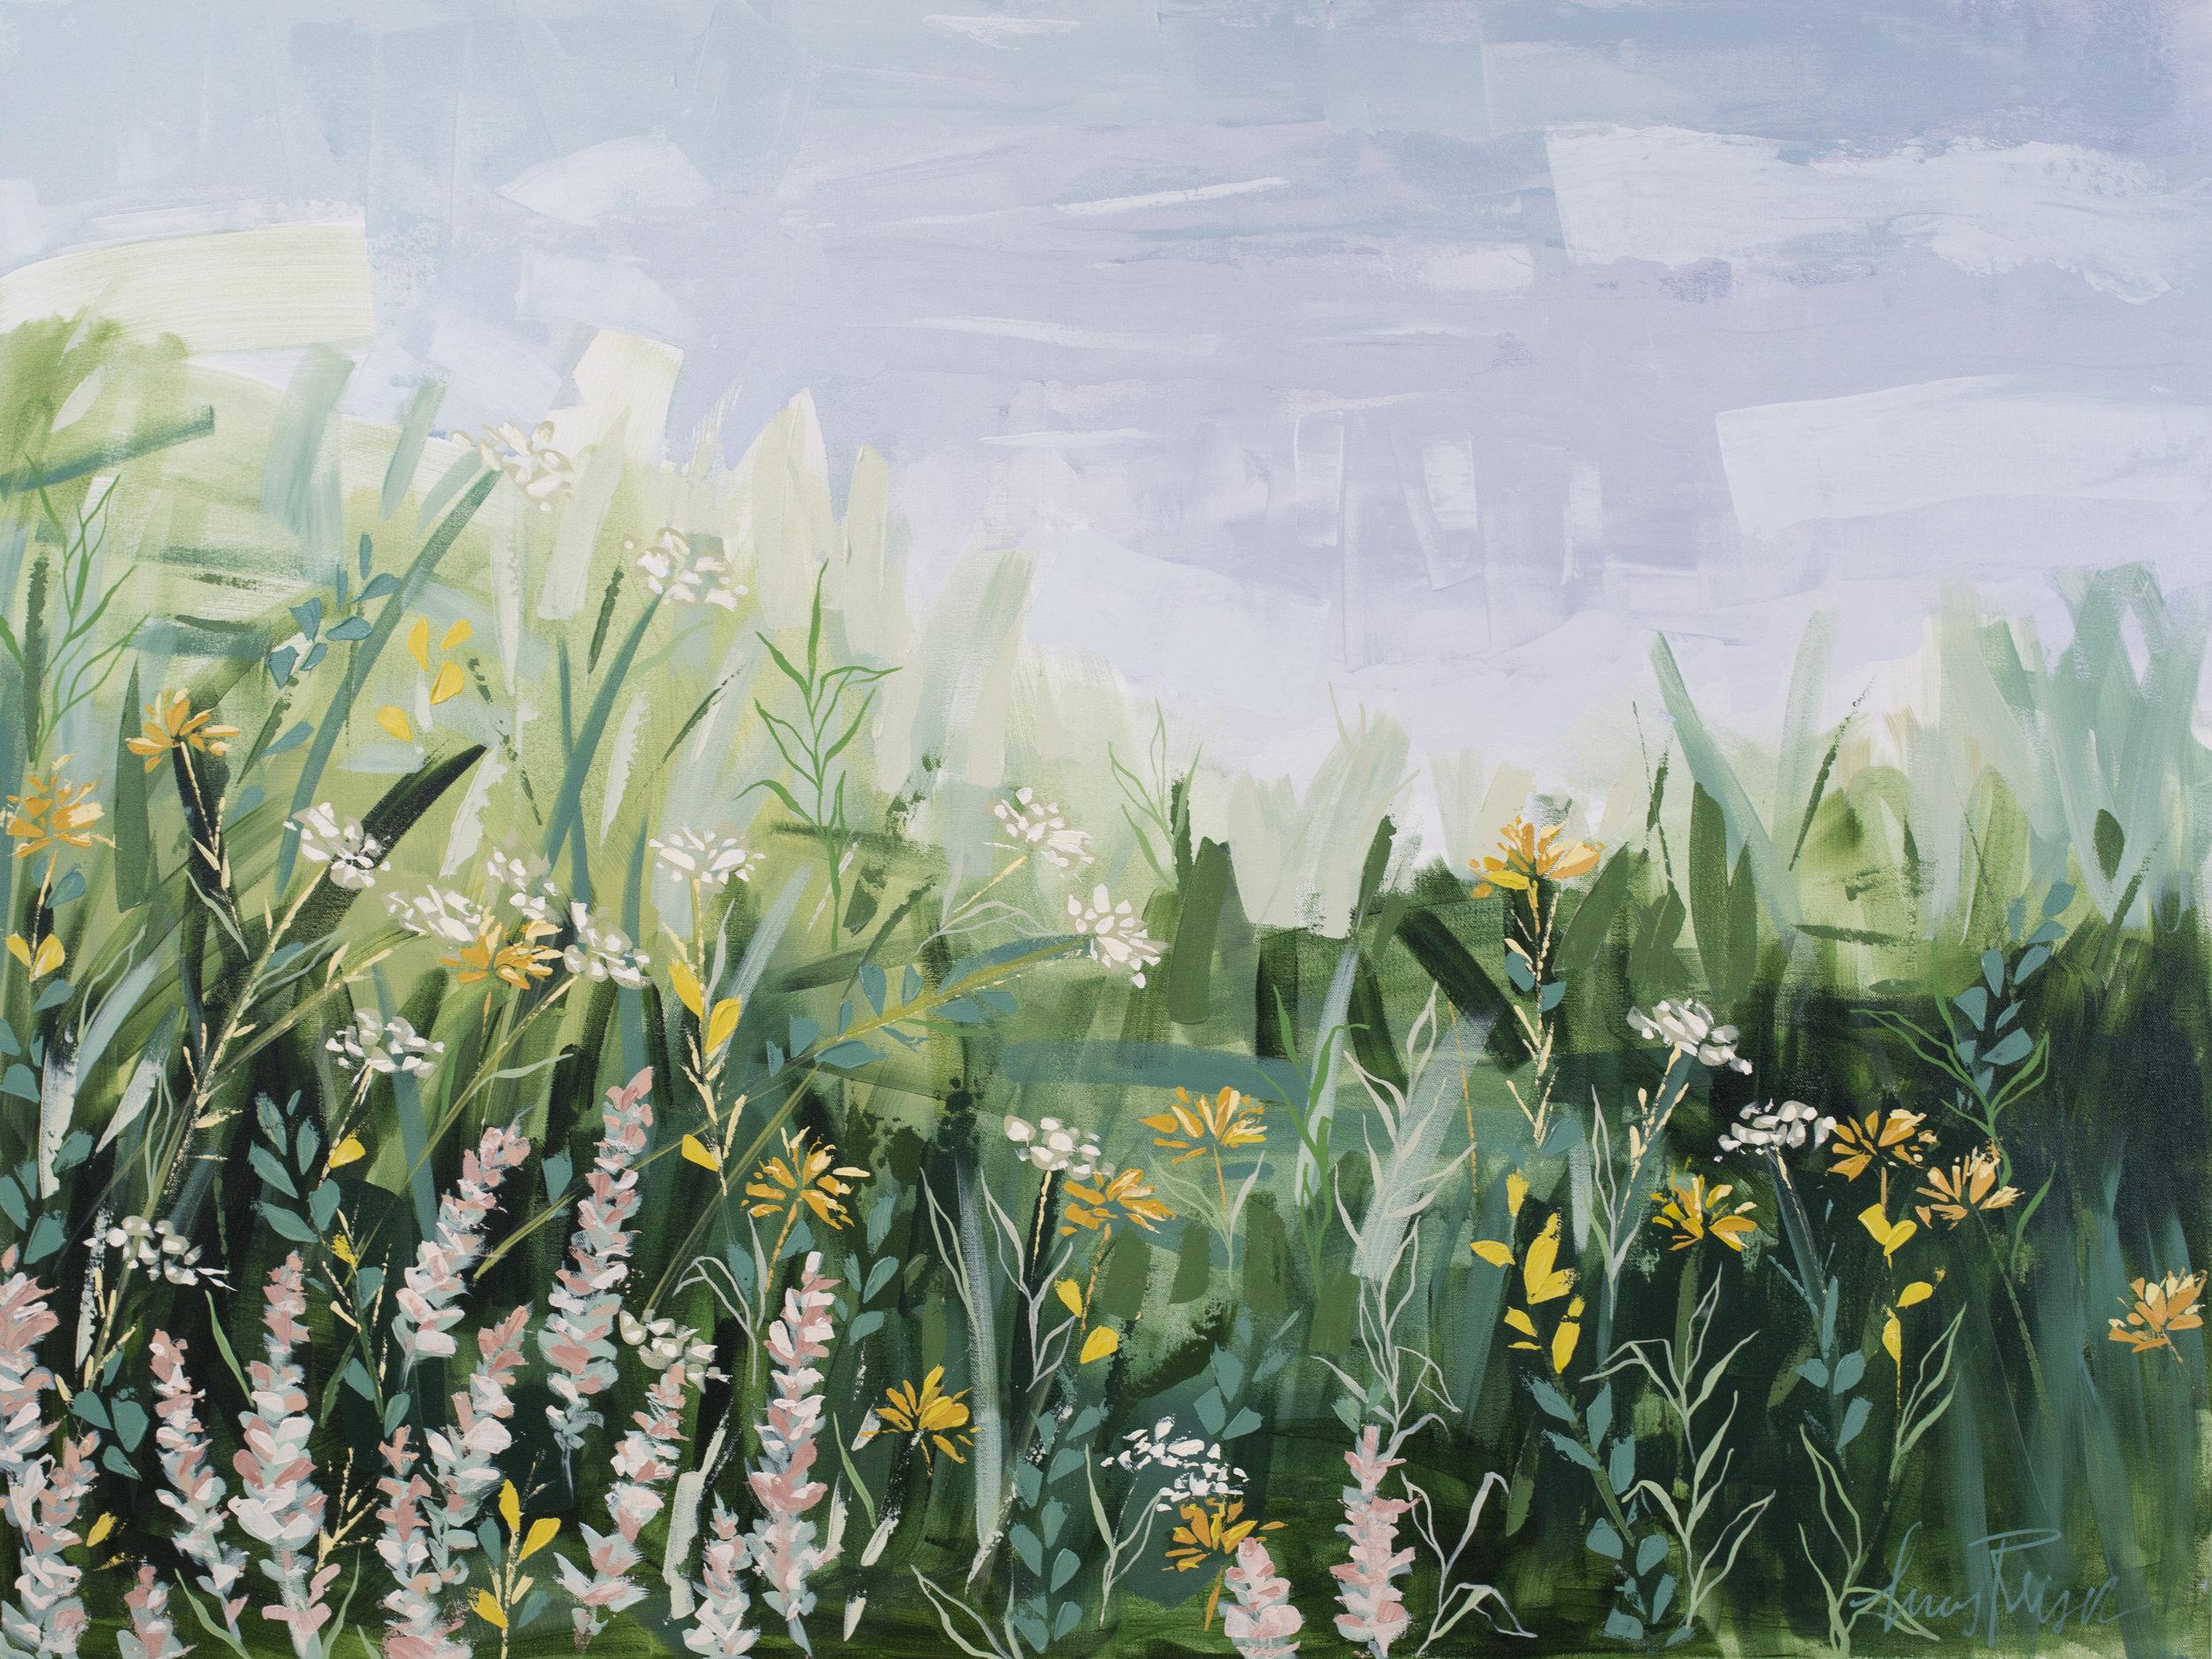 Chapman_Lucy_Painting_FairerSeasons_Brevard_Transylvania.jpg